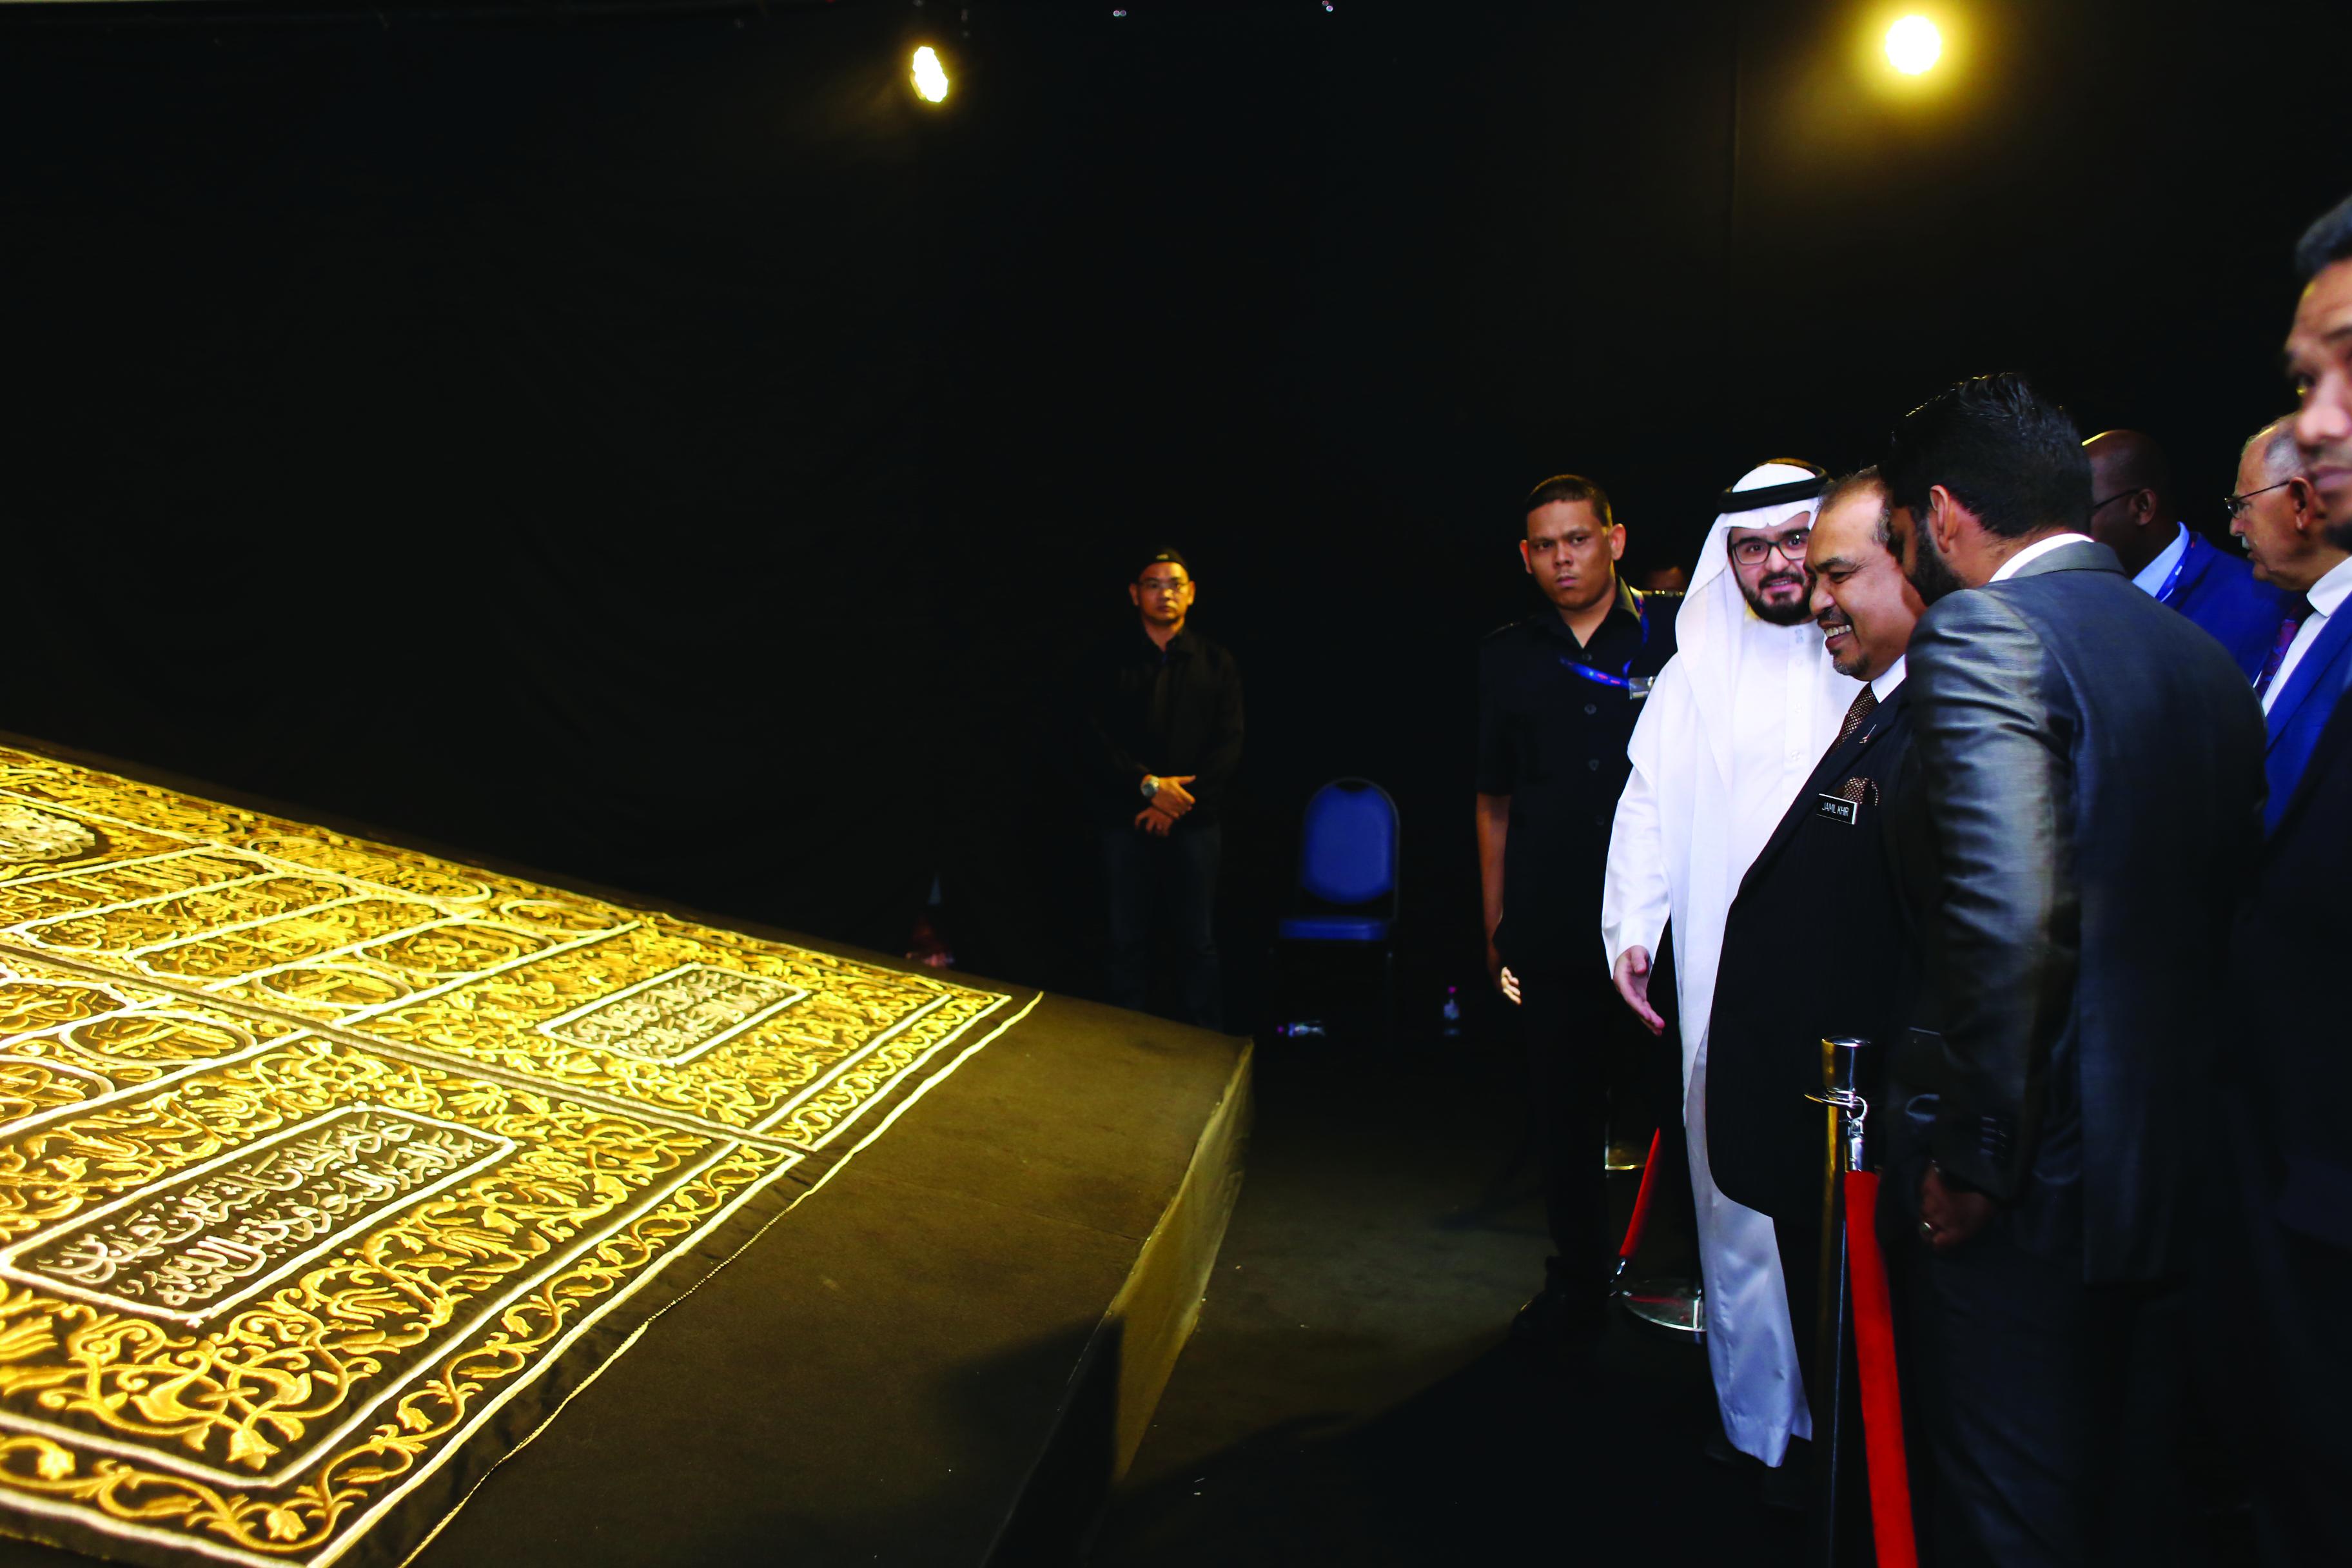 Kiswah visit by Mejar Jeneral Dato' Seri Jamil Khir Baharom accompanied by Jewels Recipient of 2015